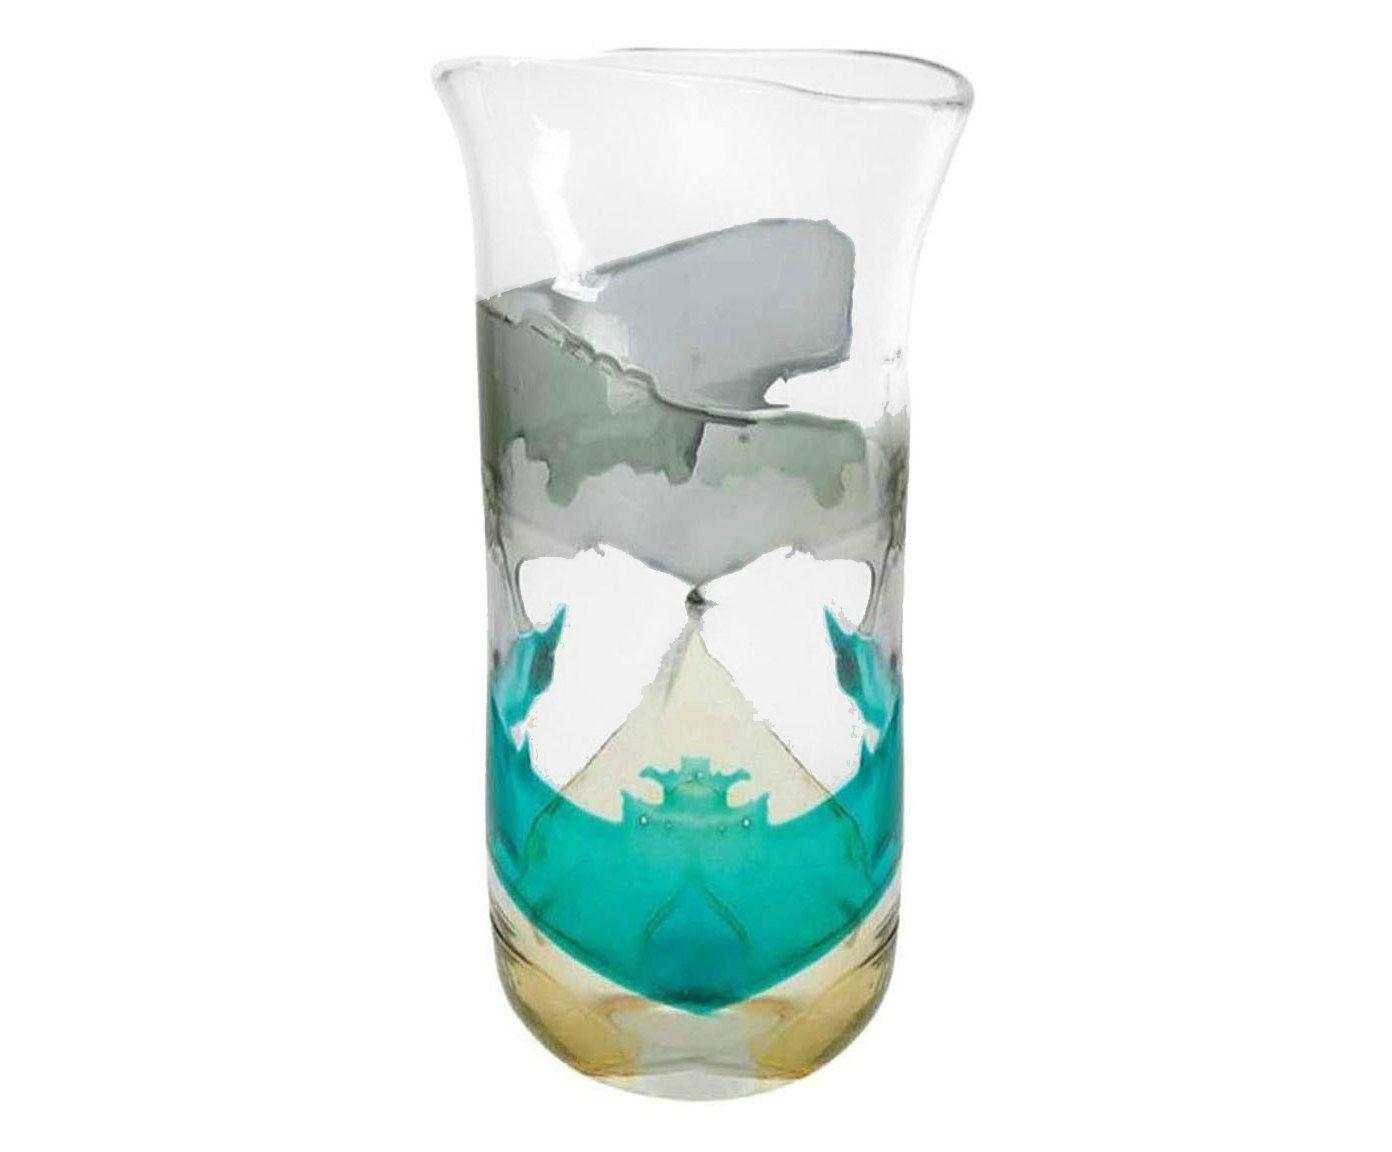 Vaso okulo criaviz - 37 x 12 cm | Westwing.com.br